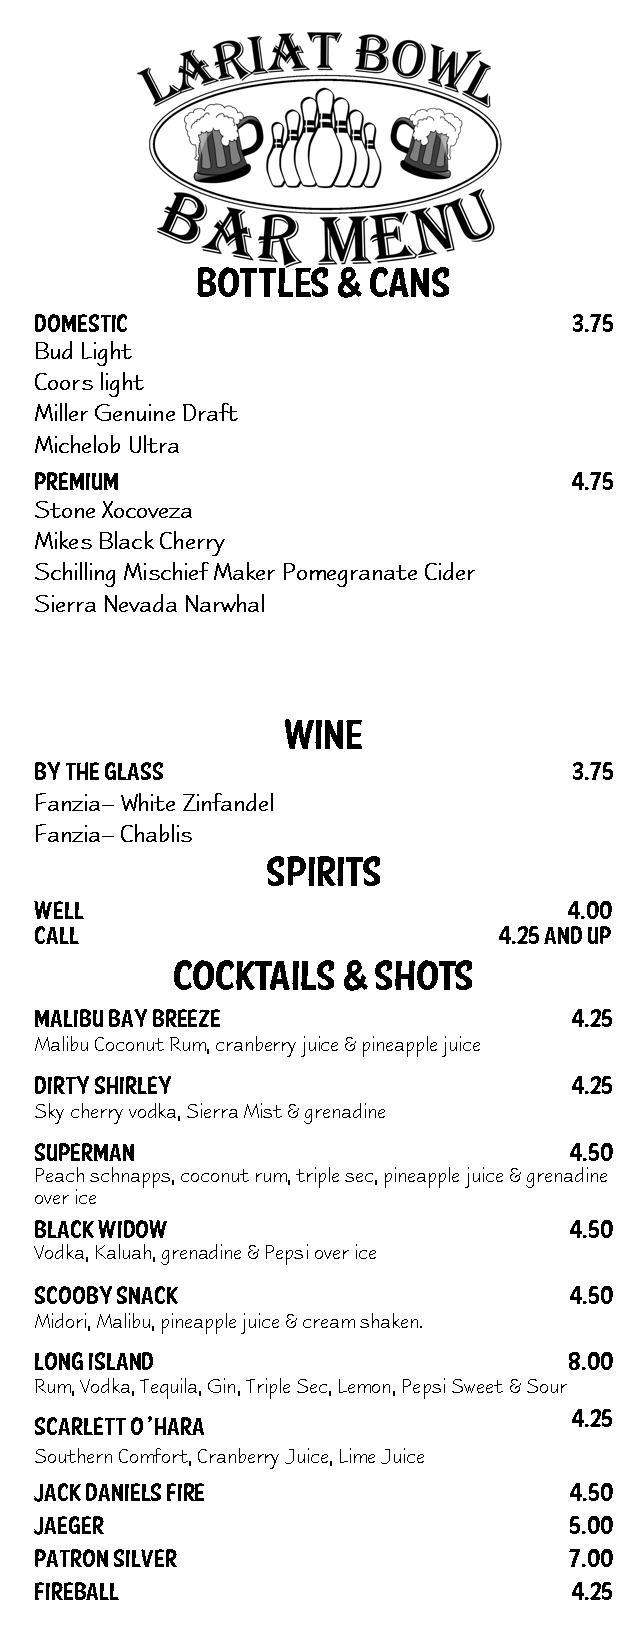 Food and Beverages at Lariat Bowl